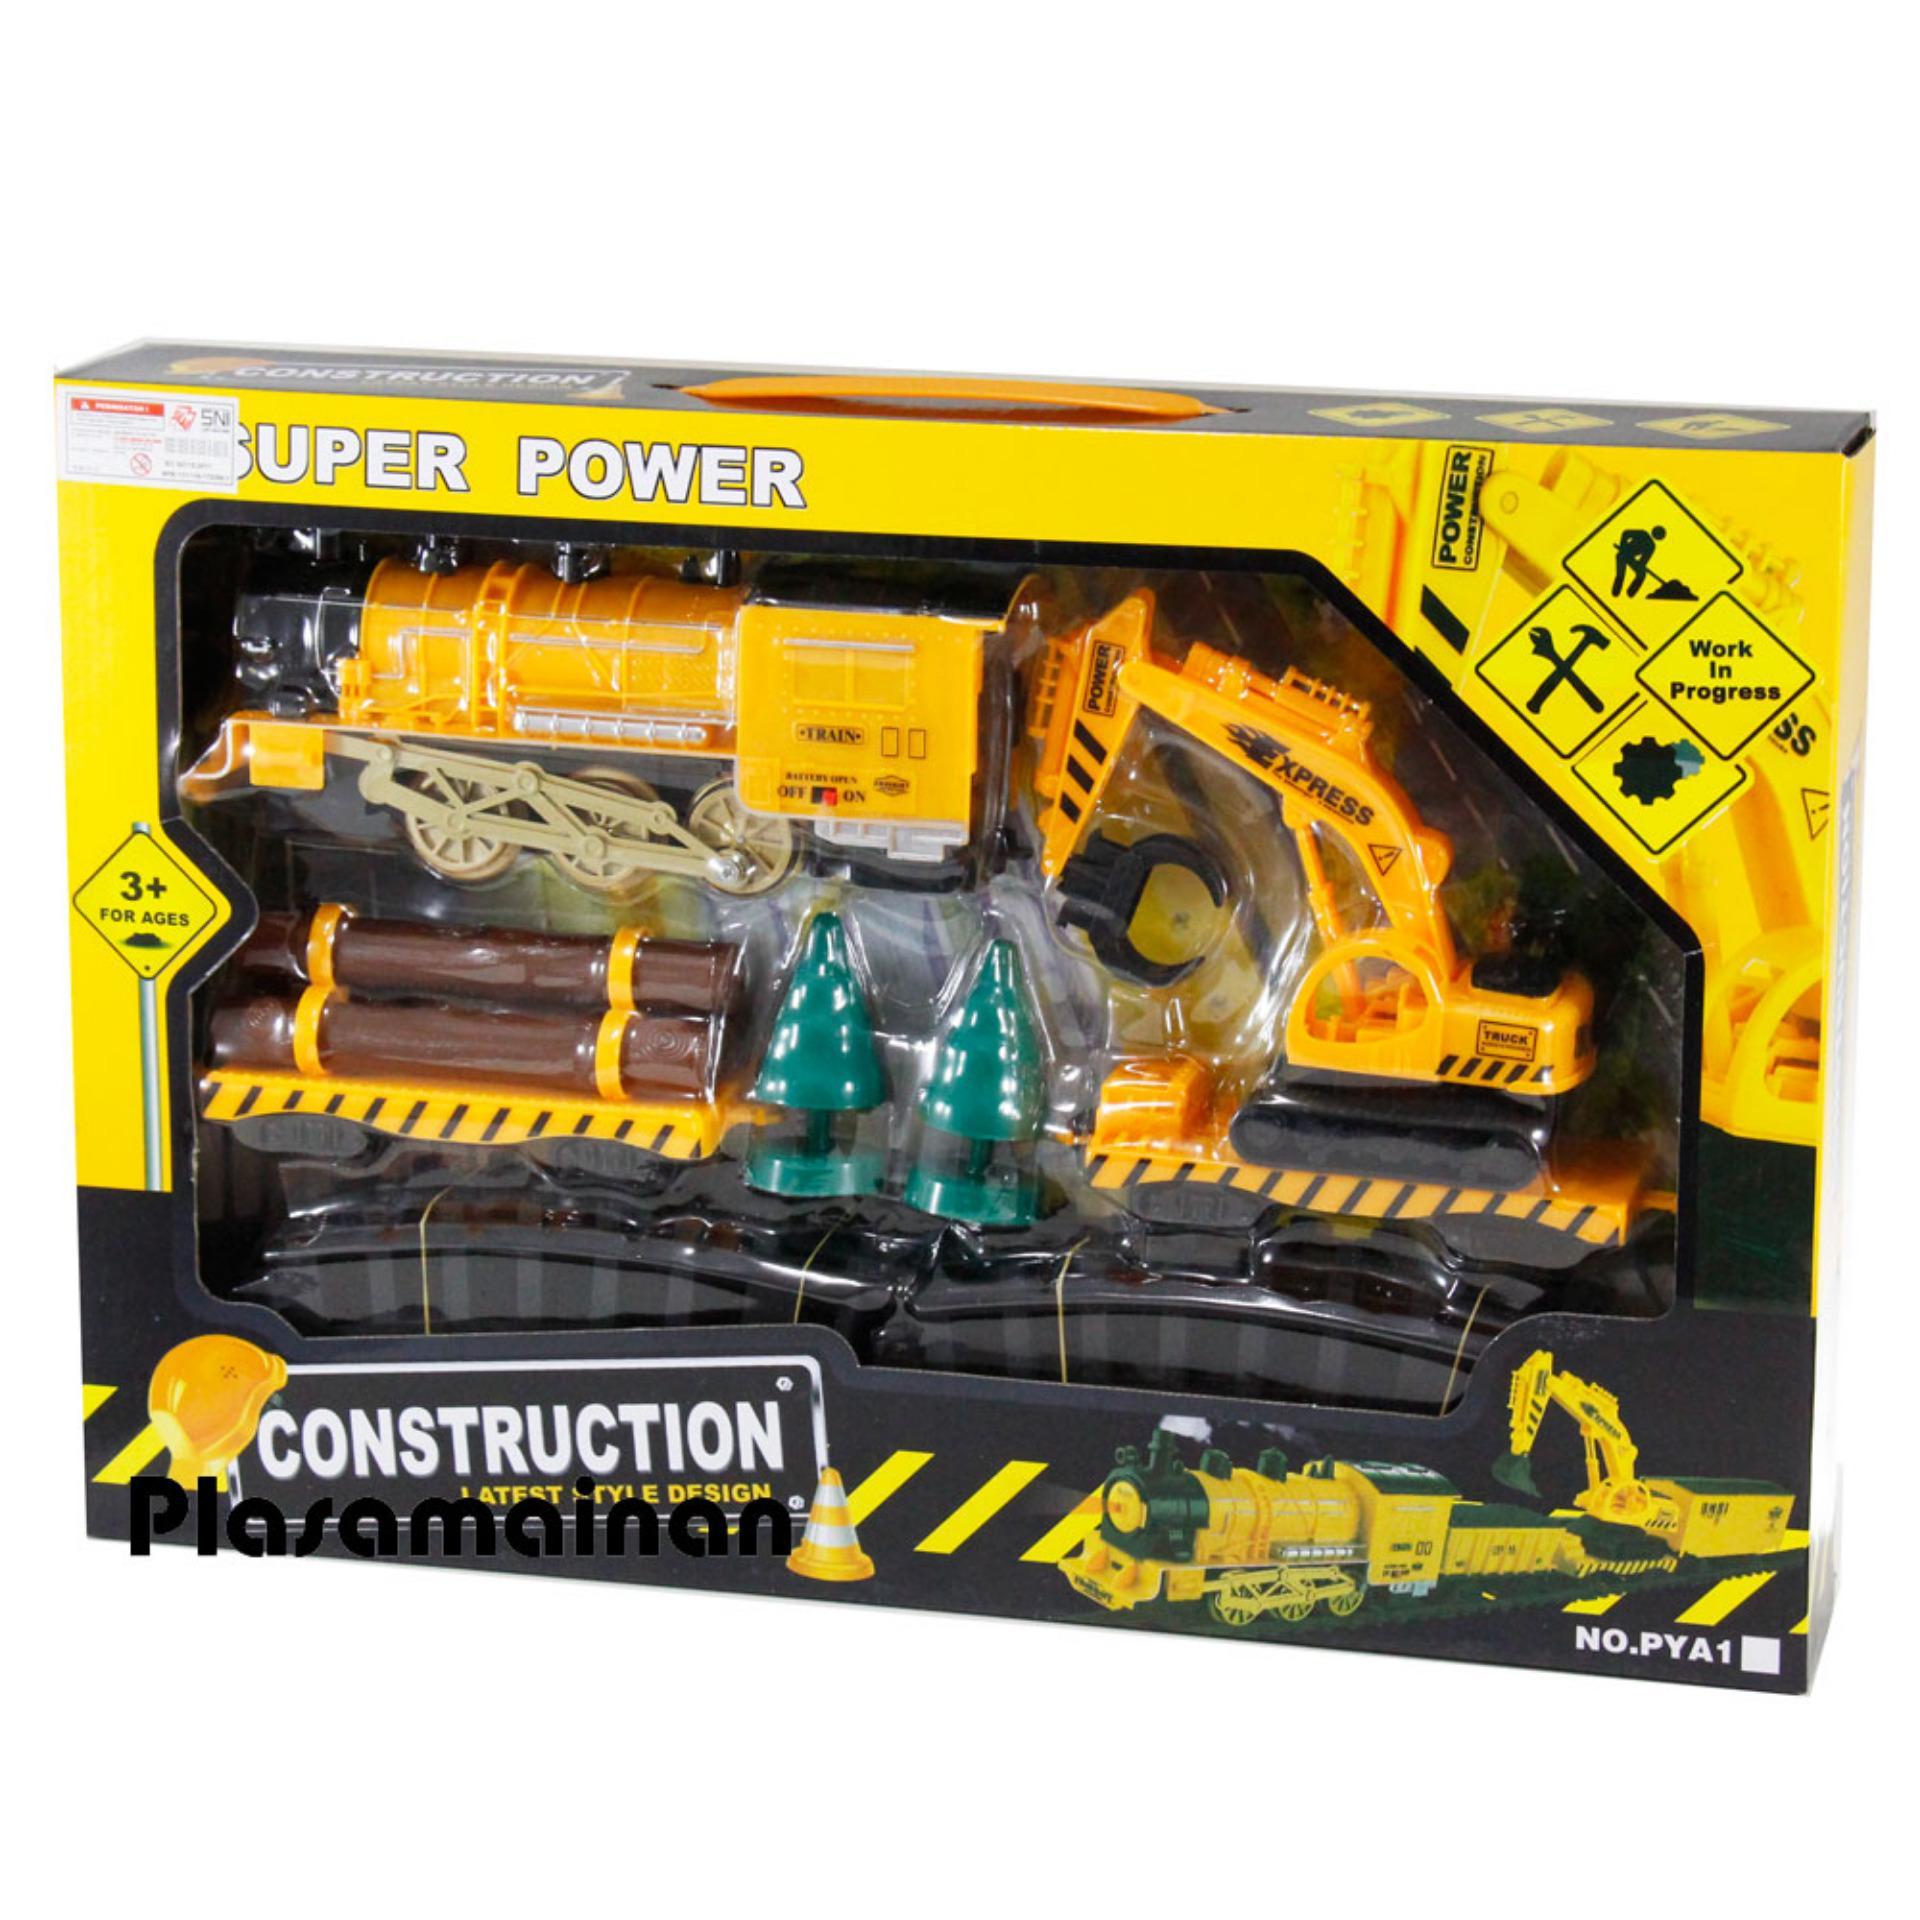 ... MOMO Toys Train Construction Super Power - Mainan Anak Kereta Api Plus Truck Excapator / Beko ...